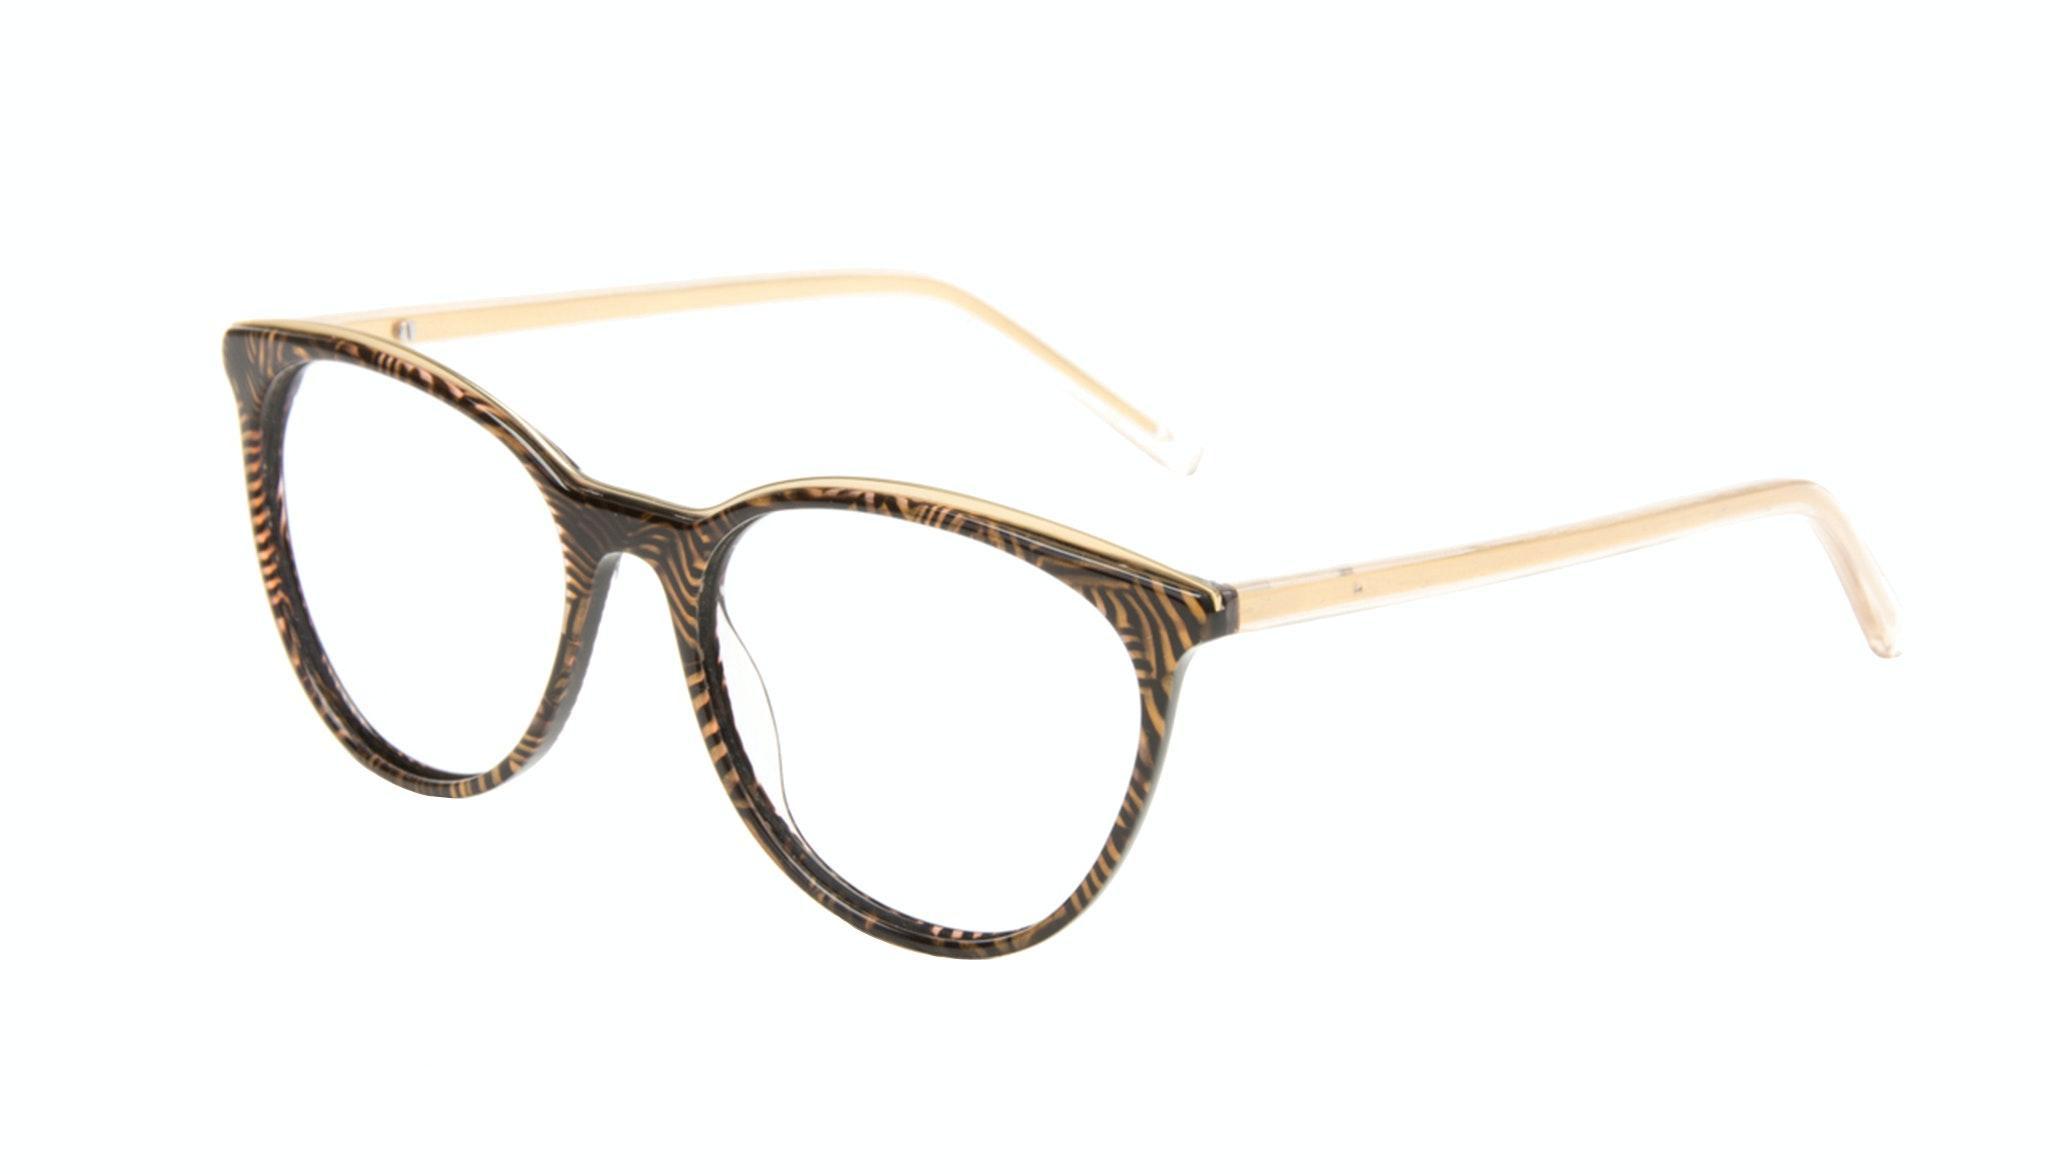 Affordable Fashion Glasses Round Eyeglasses Women Gypsy Copper Tort Tilt